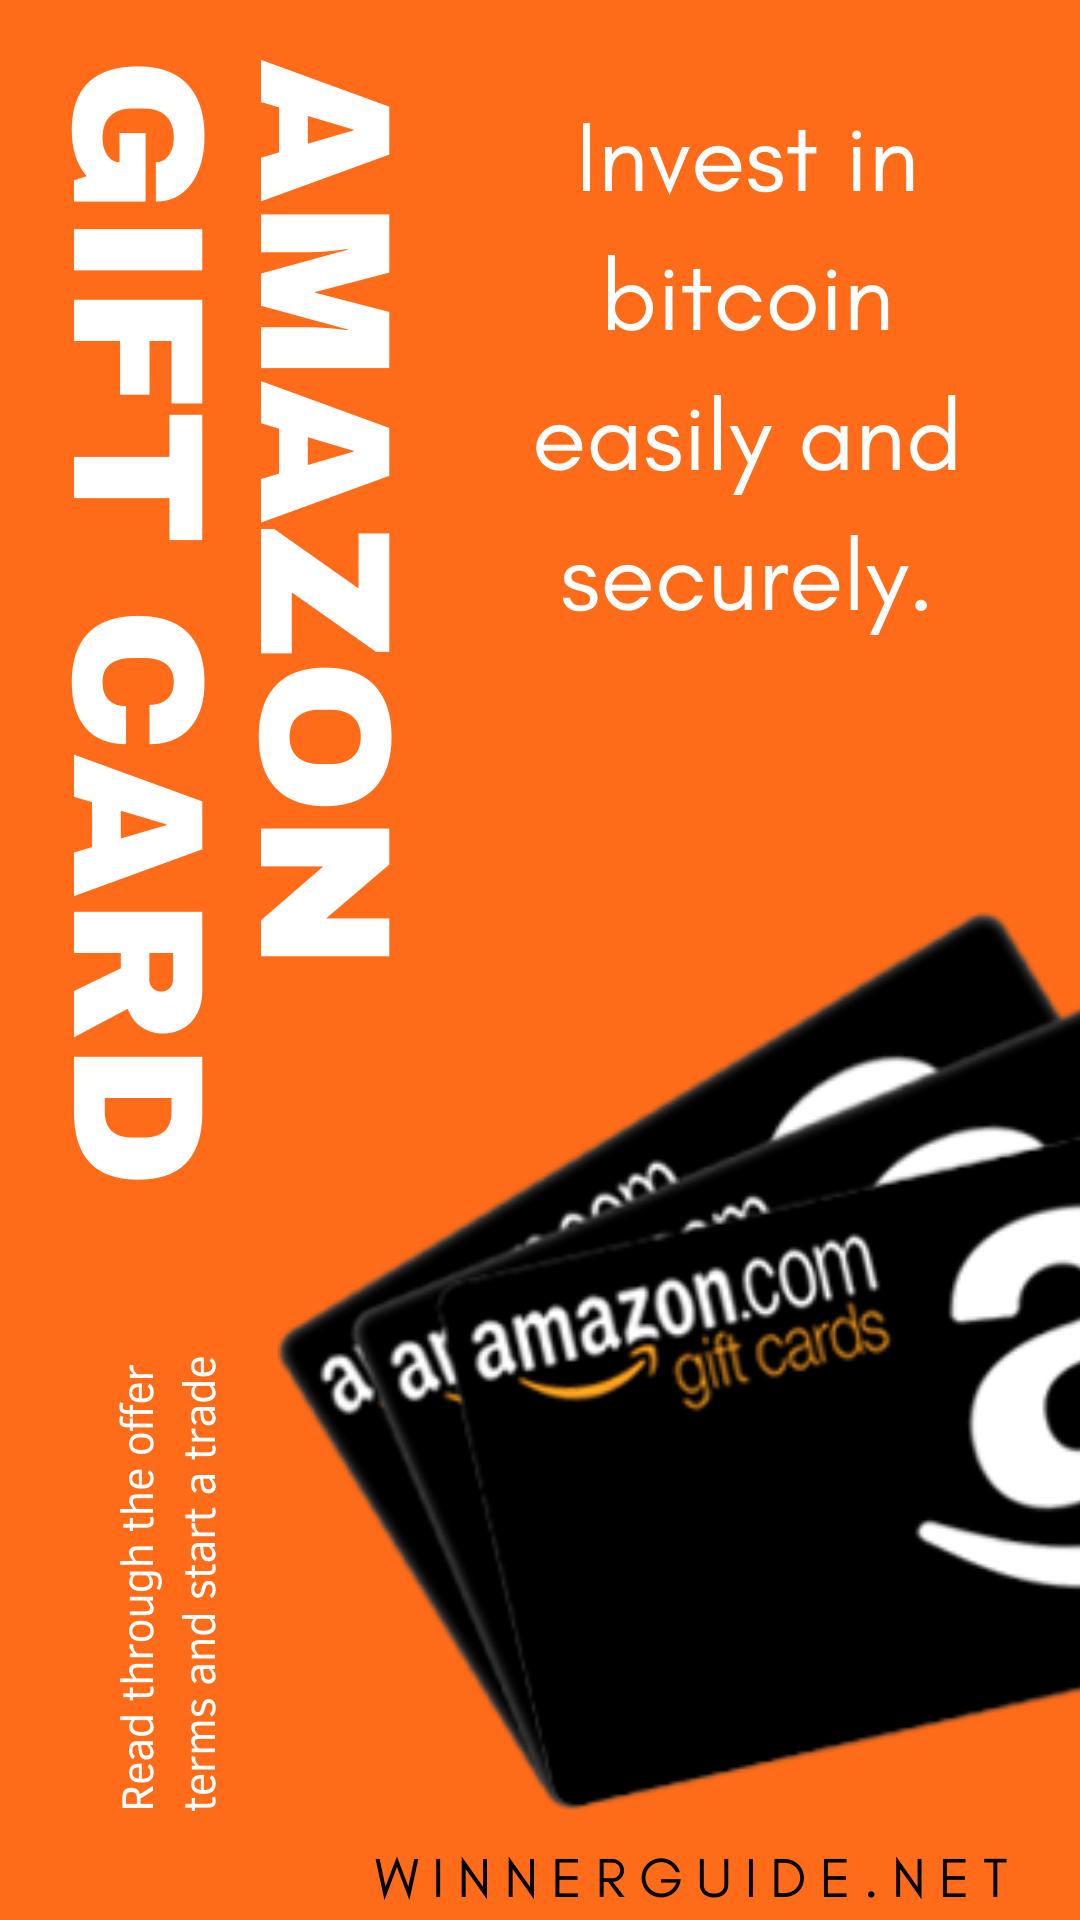 Amazon Geschenkkarten Amazon Gift Cards Amazon Gifts Itunes Gift Cards